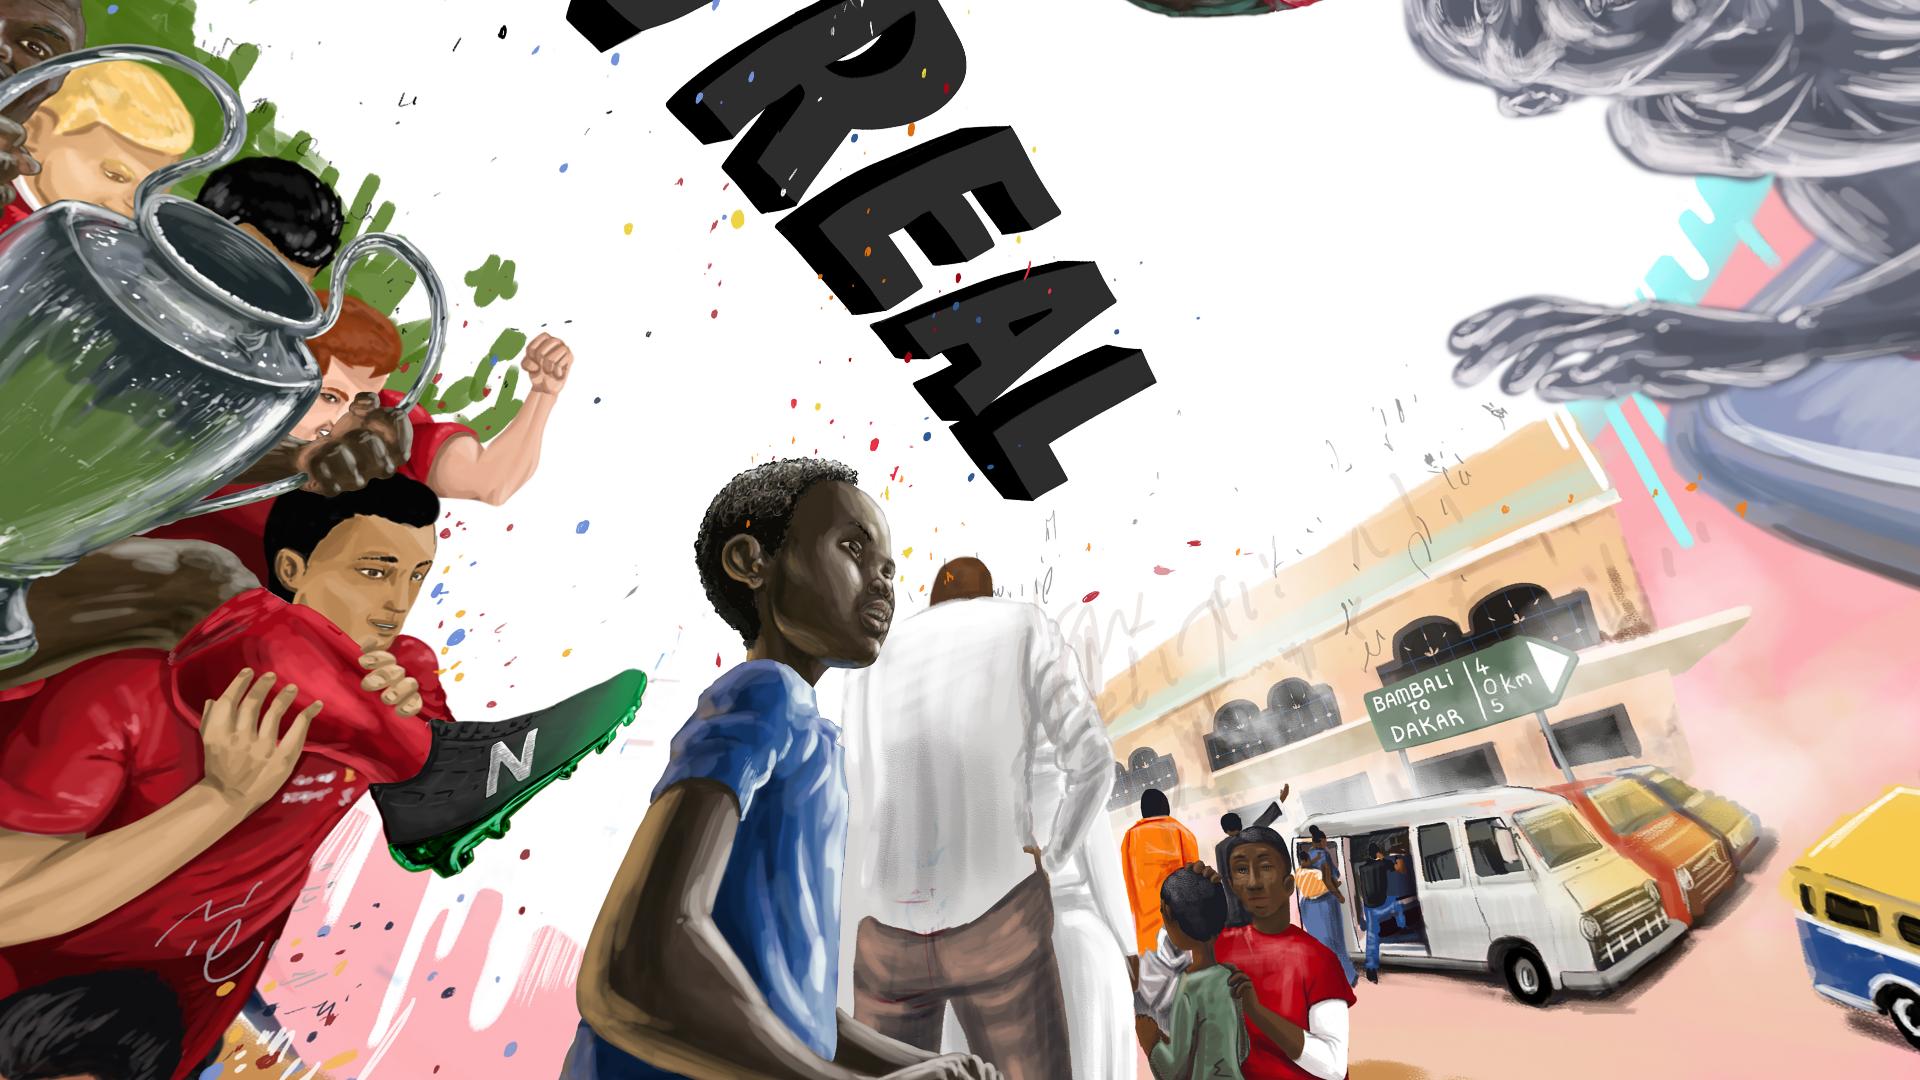 Unreal - The Sadio Mane Story